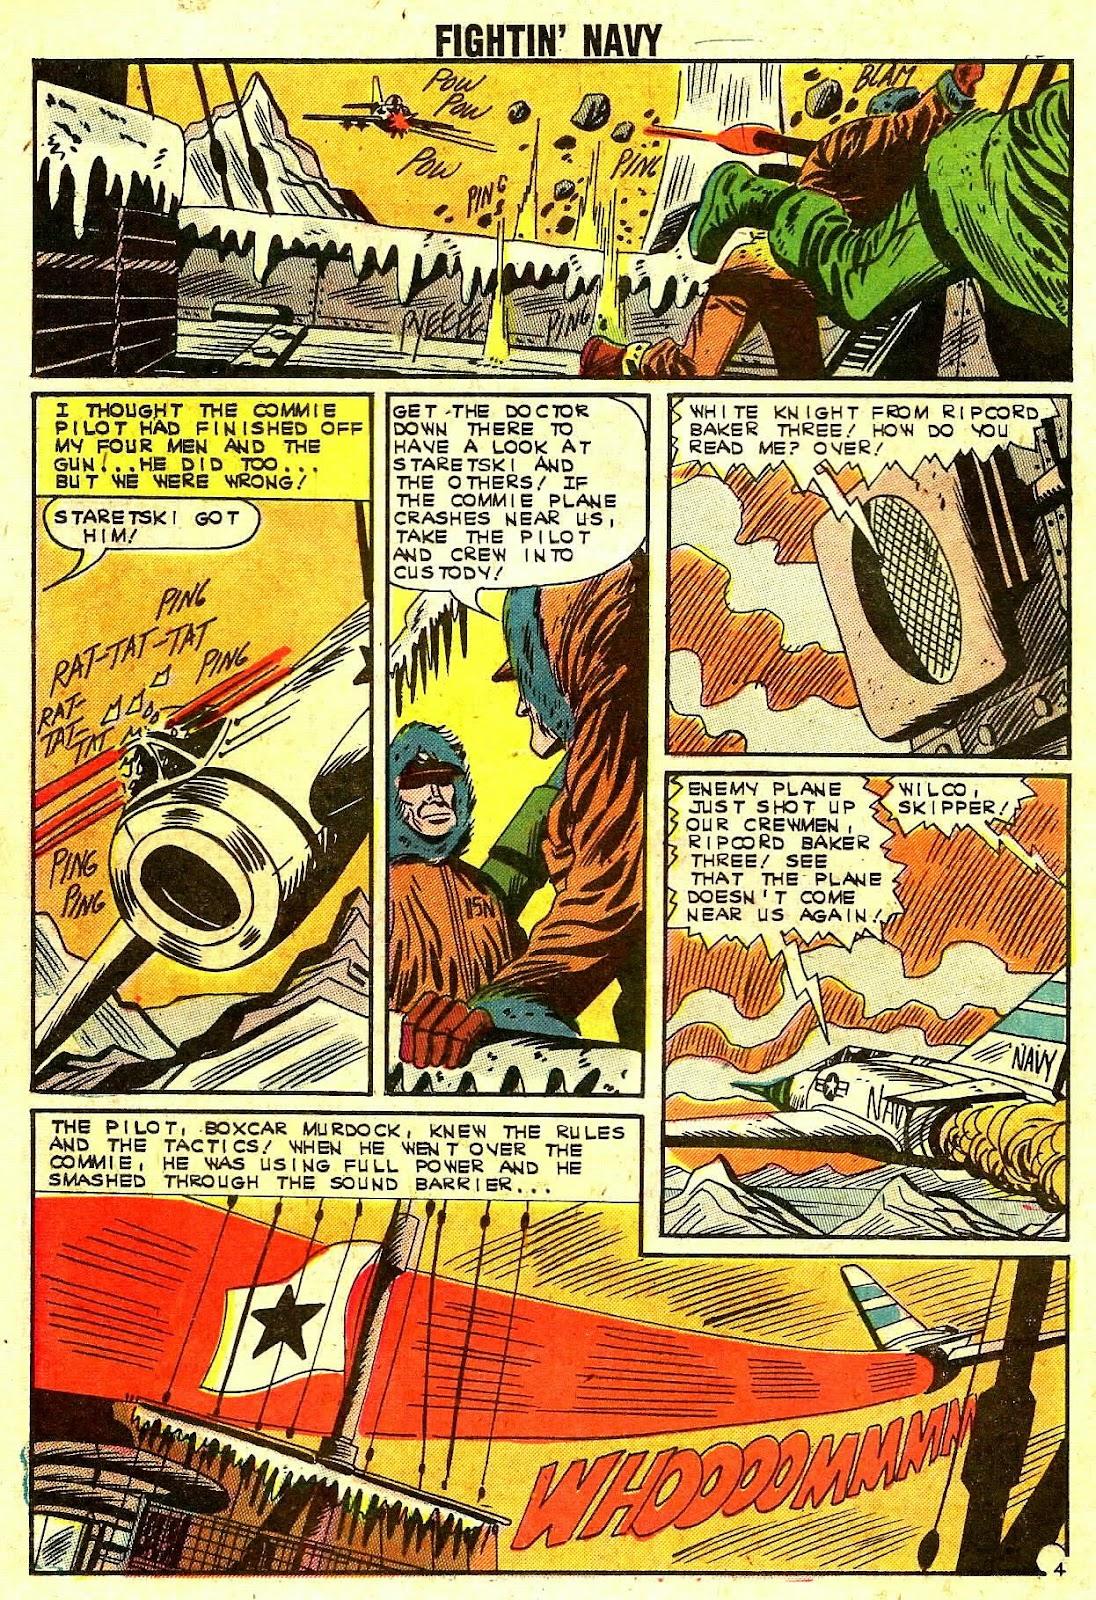 Read online Fightin' Navy comic -  Issue #109 - 18